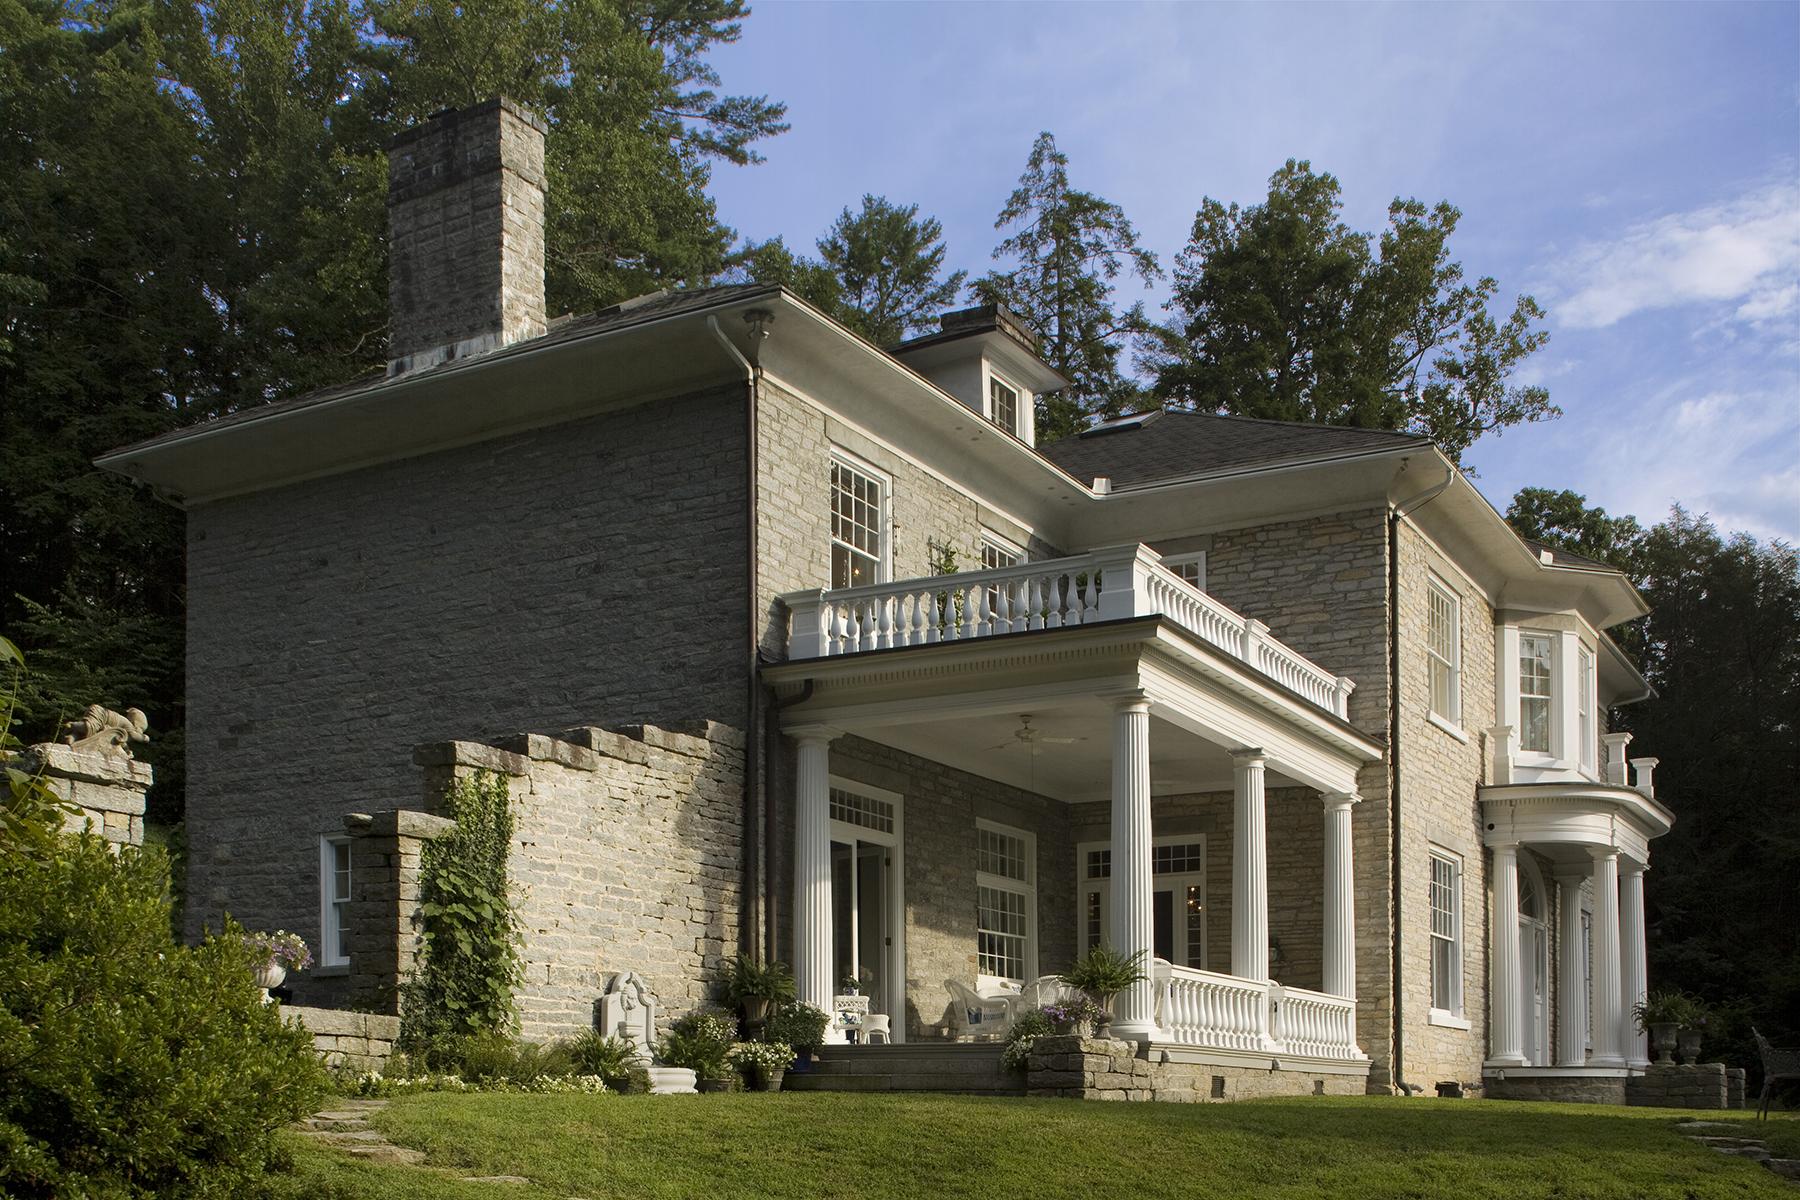 Single Family Home for Sale at 1001 Estate Dr , Chanteloup, Flat Rock, NC 28739 1001 Estate Dr Chanteloup, Flat Rock, North Carolina 28739 United States